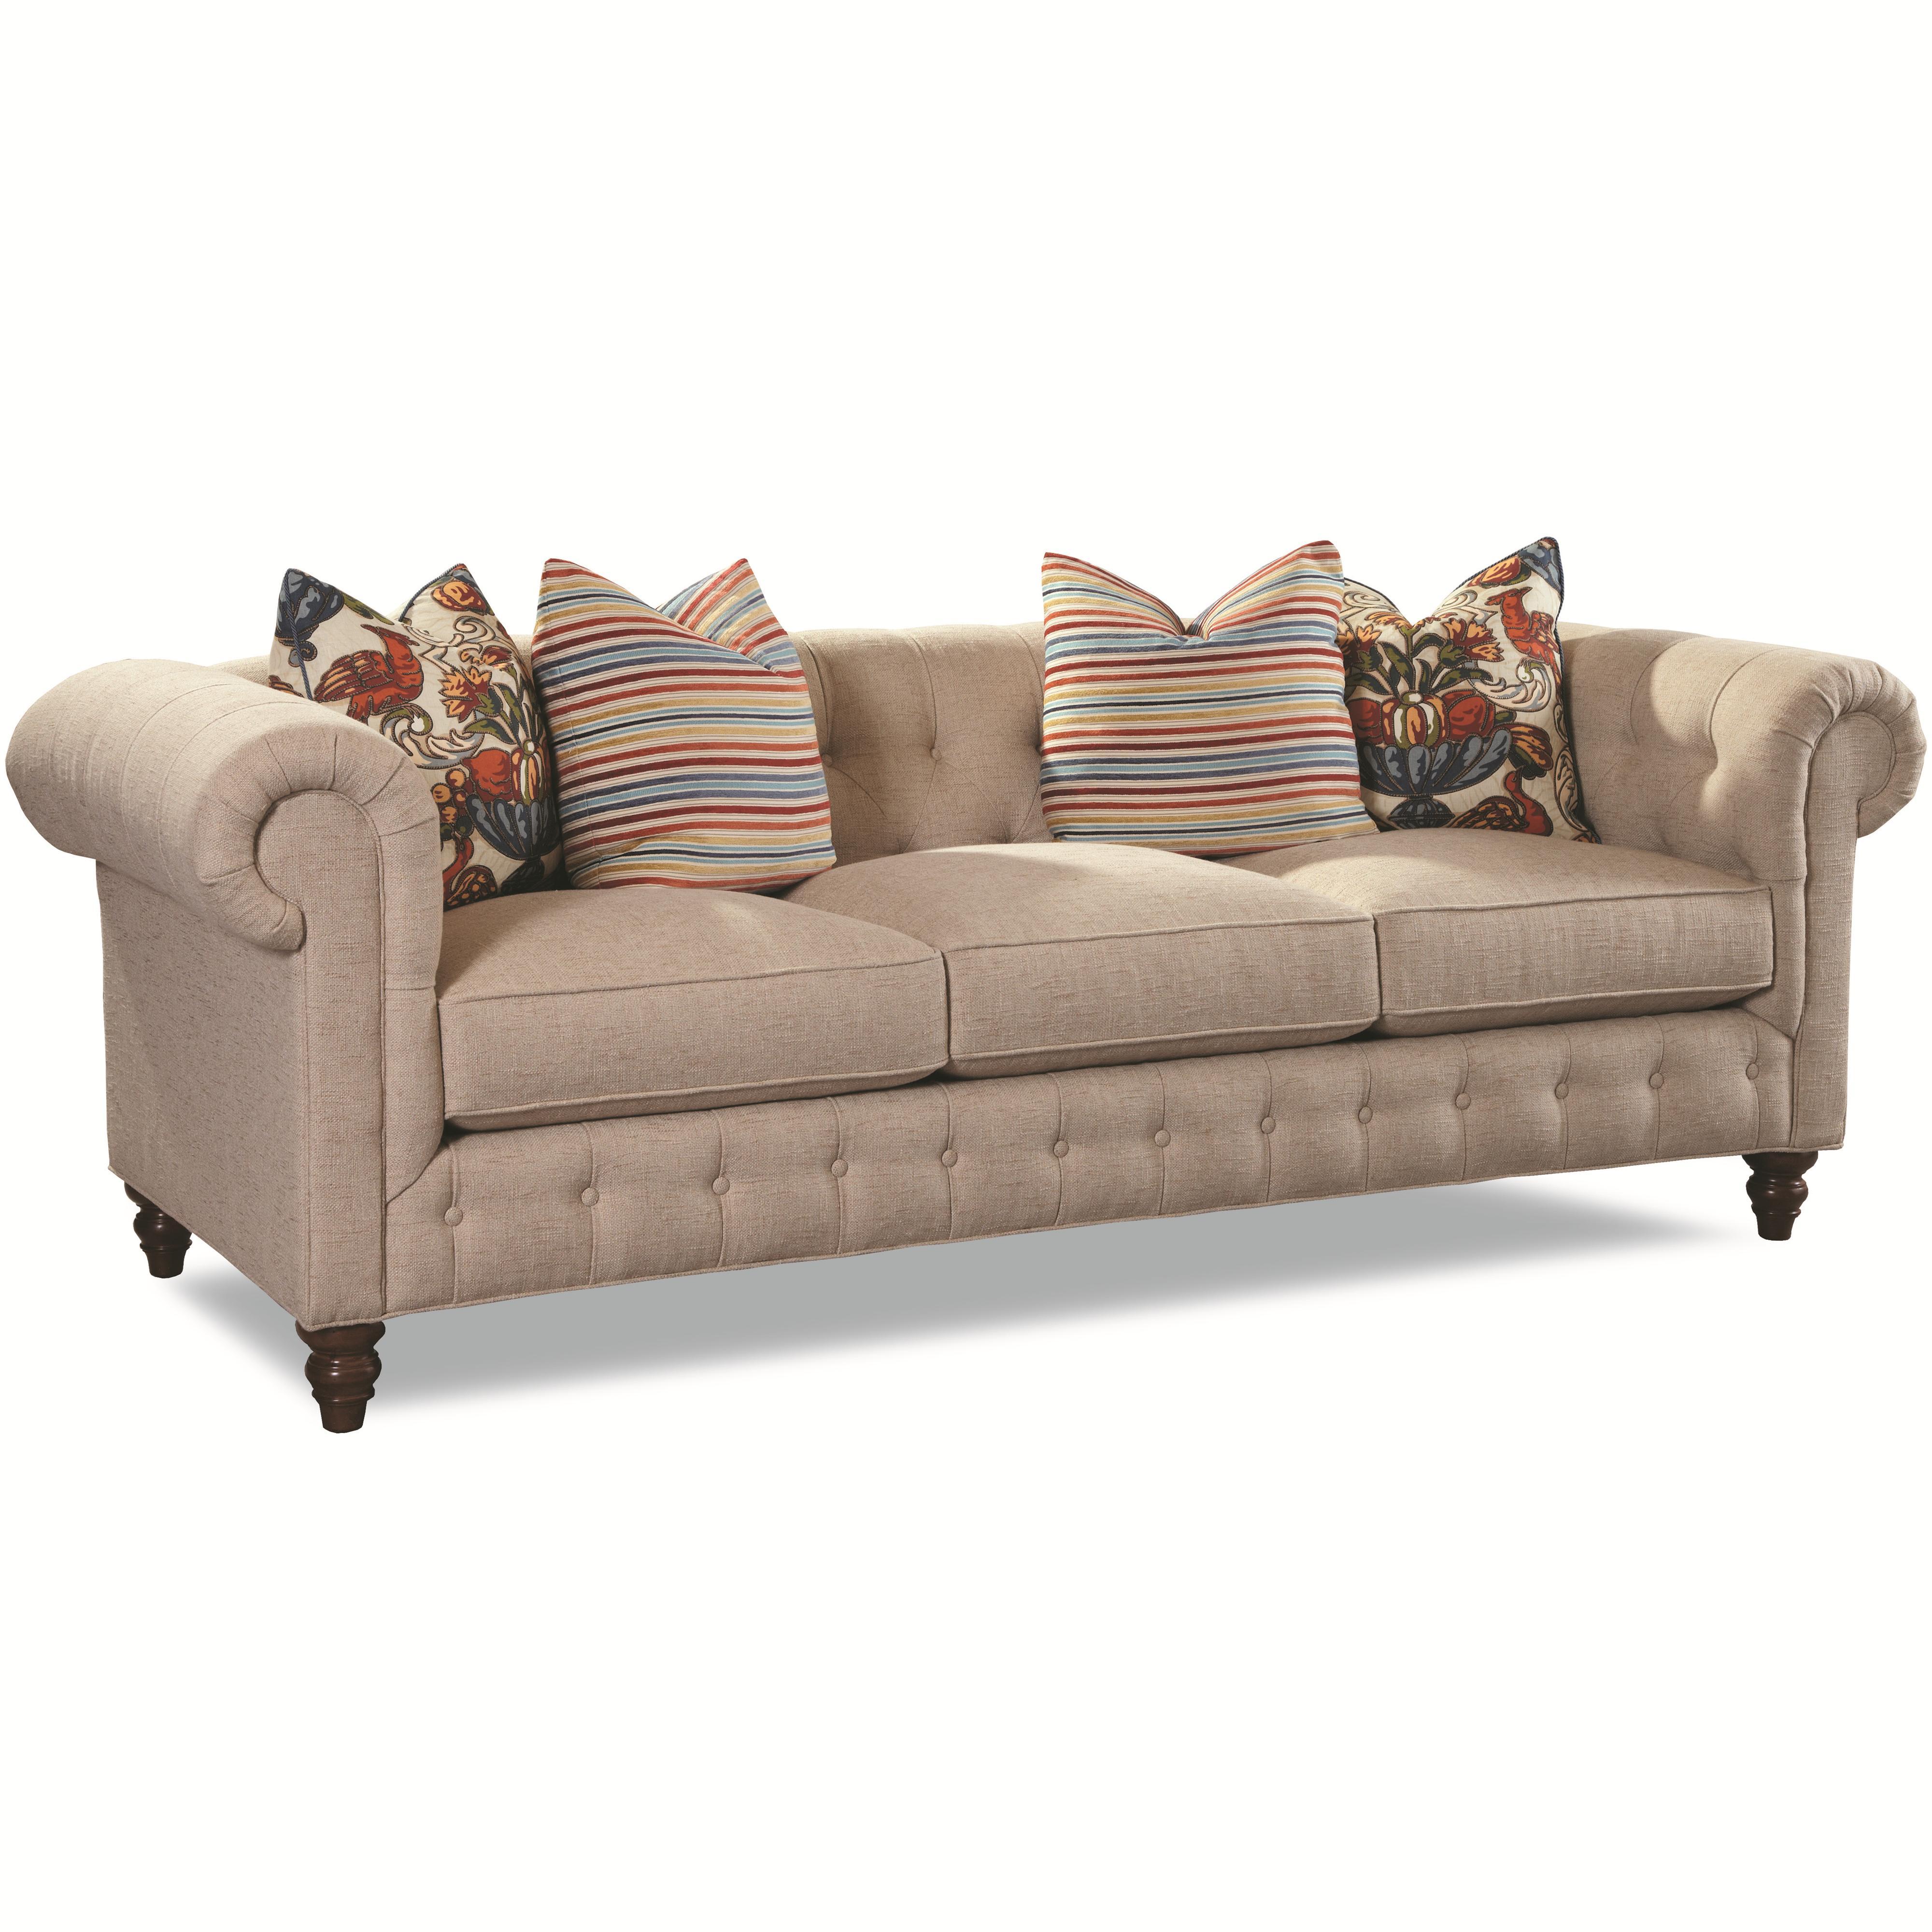 7498 Traditional Sofa by Geoffrey Alexander at Sprintz Furniture